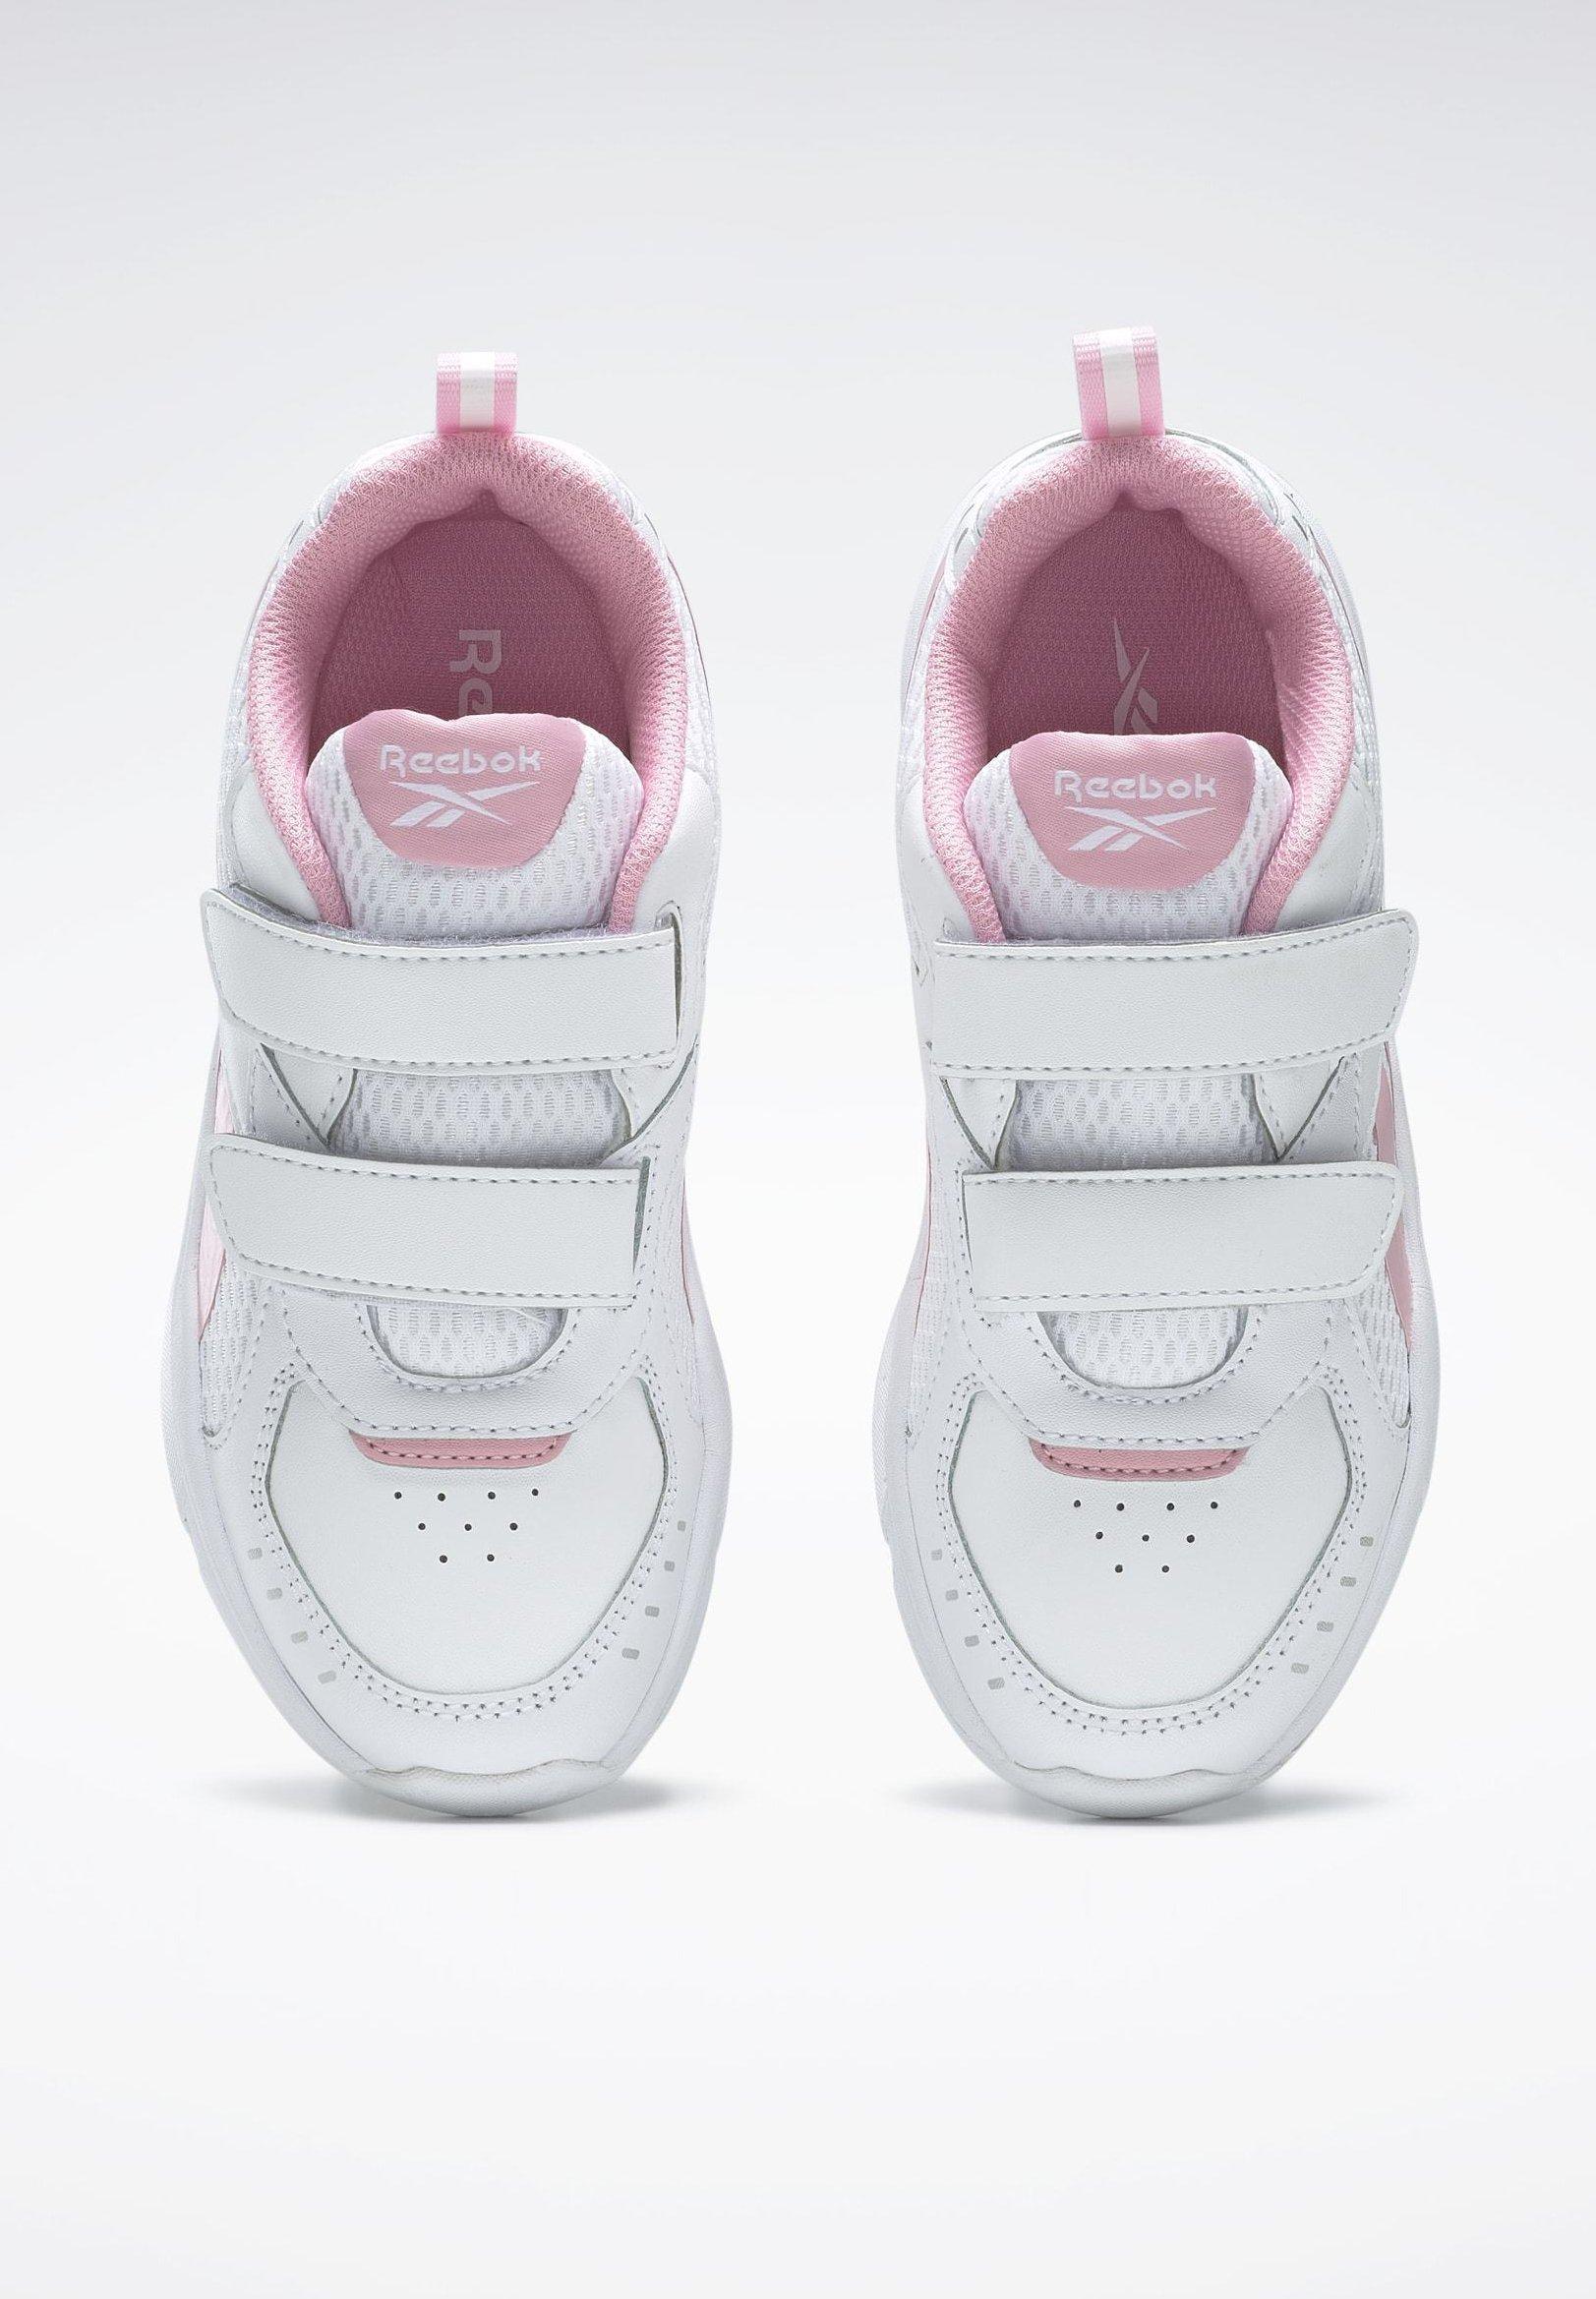 SPRINTER Hardloopschoenen neutraal white